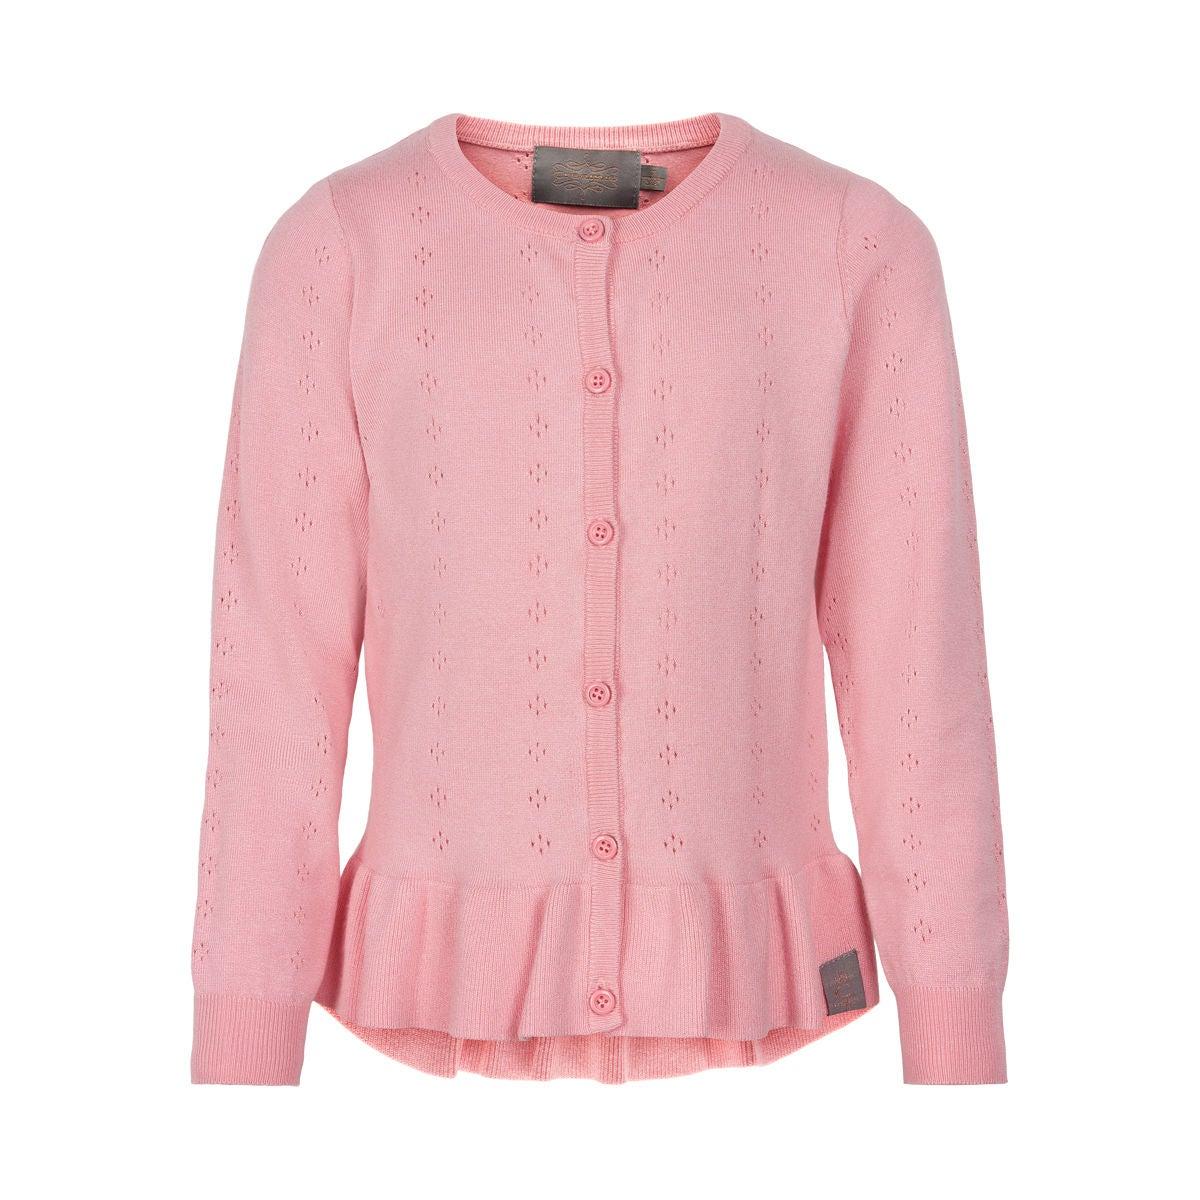 Creamie Pointelle Kofta, Pink Icing, 152